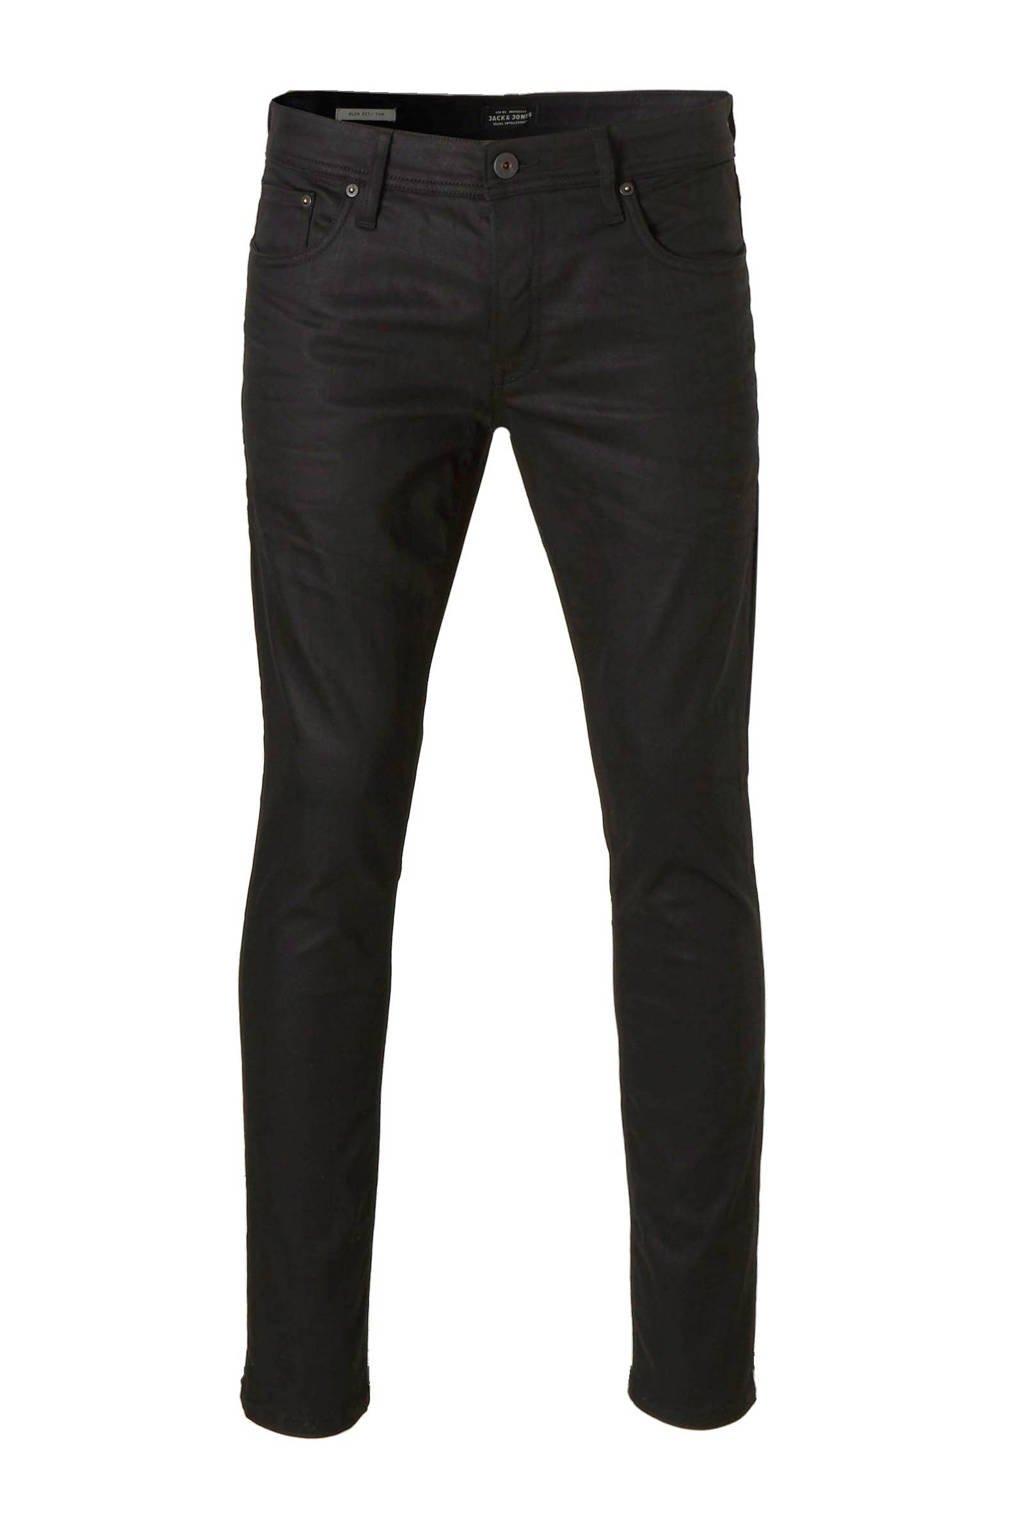 JACK & JONES slim fit jeans Tim, 220 Black Denim